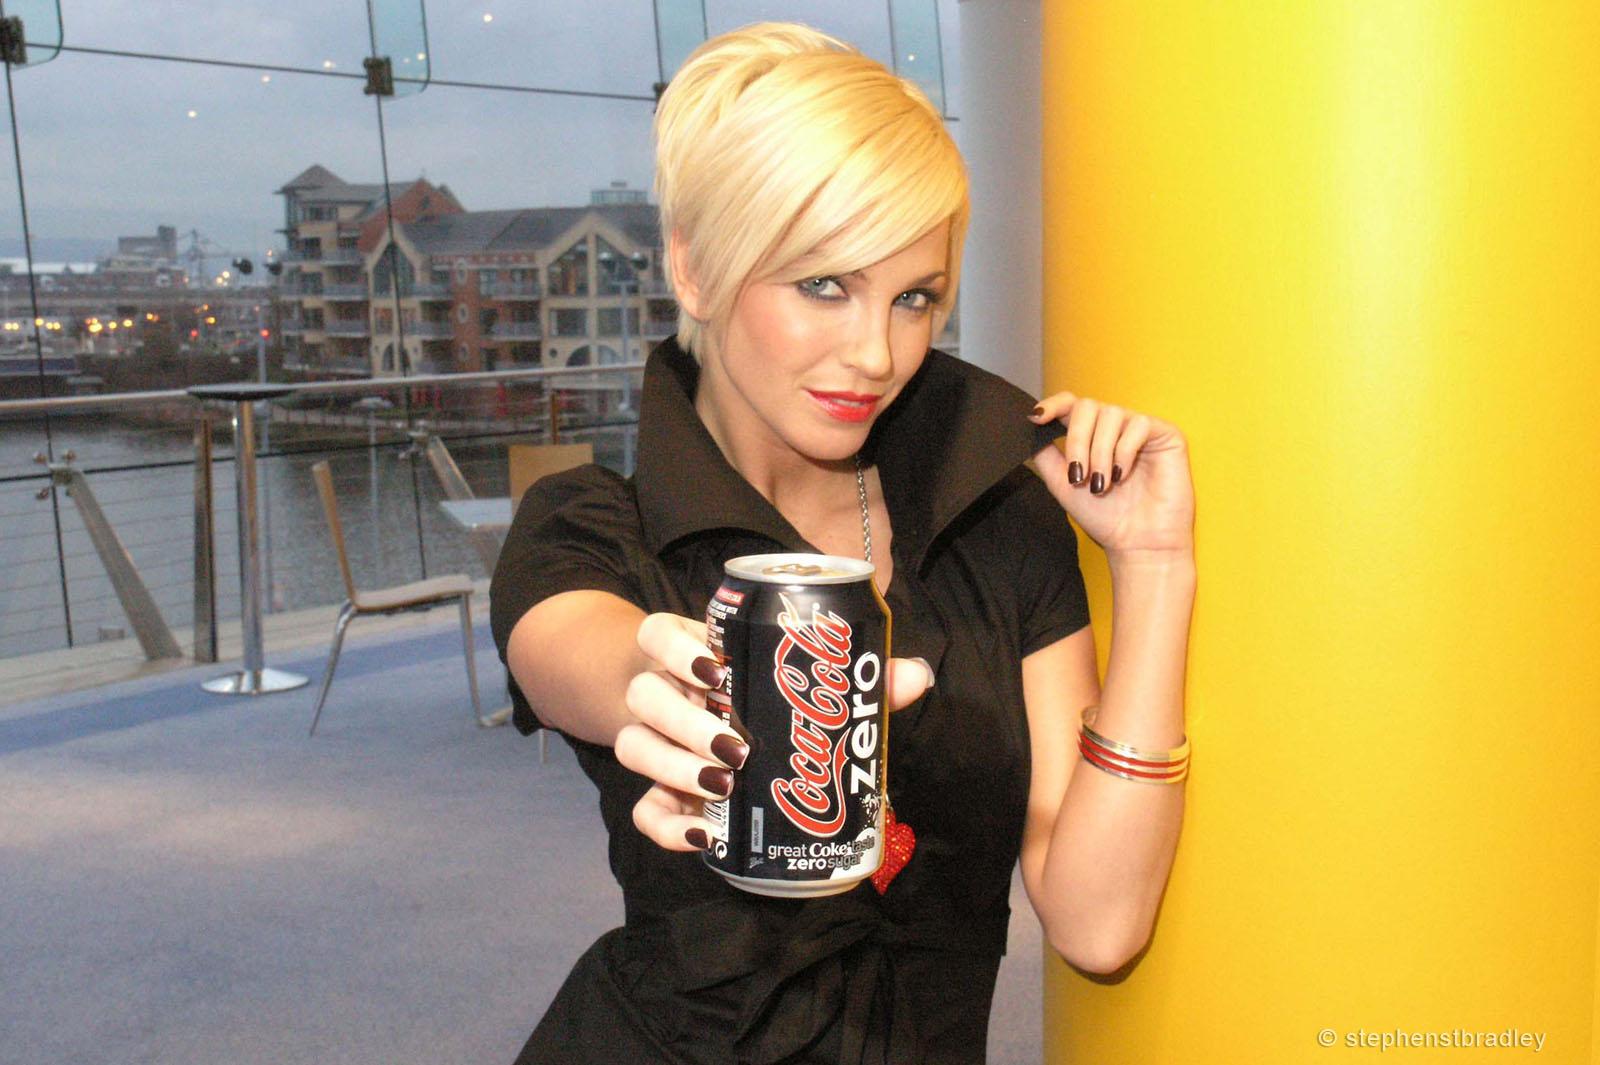 PR Photographer Dublin Ireland photo 1014114 - Sarah Harding Girls Aloud promoting Coca Cola Zero for Edelman PR